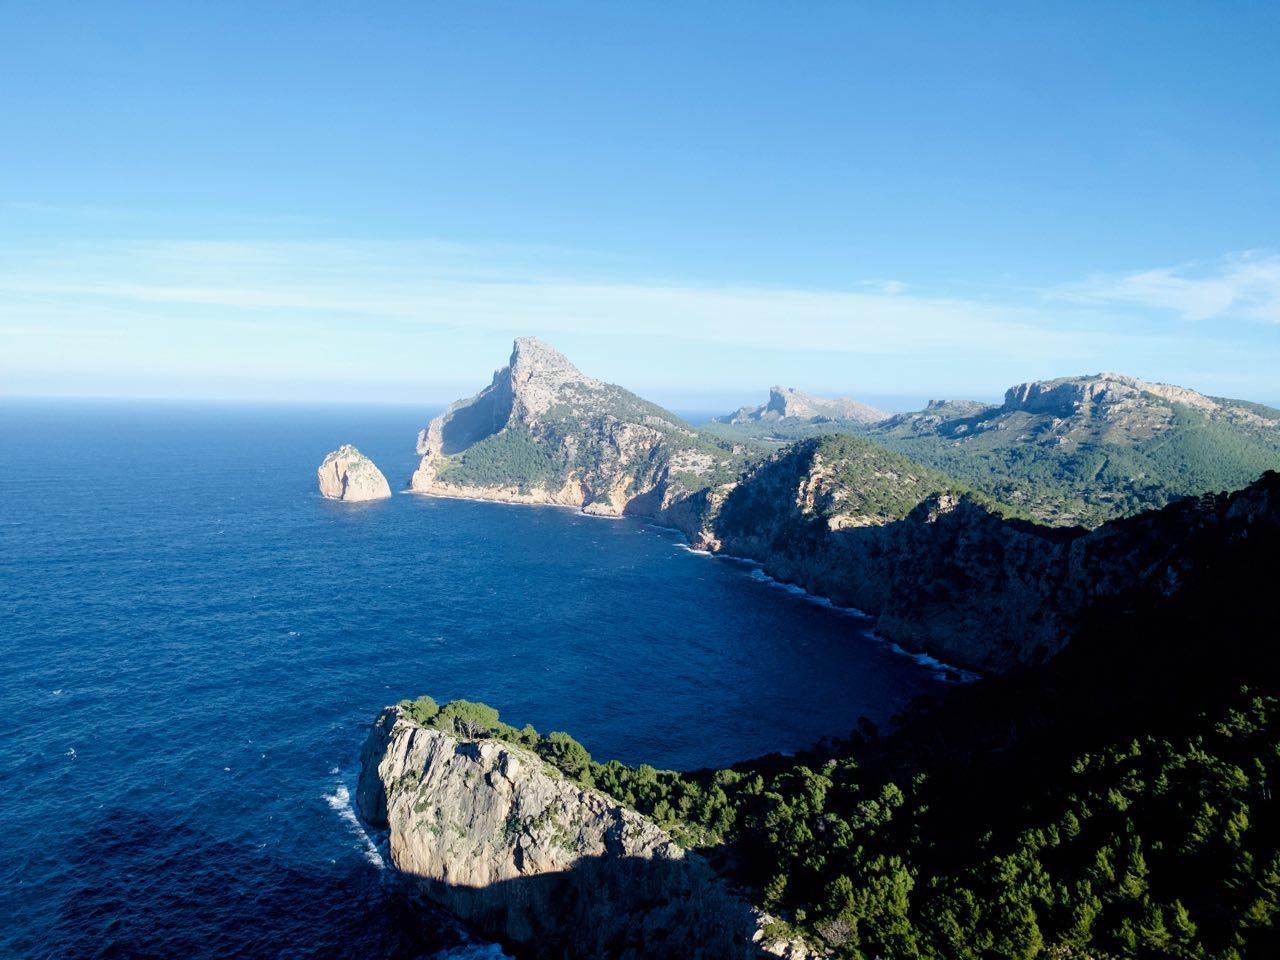 Fotoreise Mallorca 10. - 15. Oktober 2019